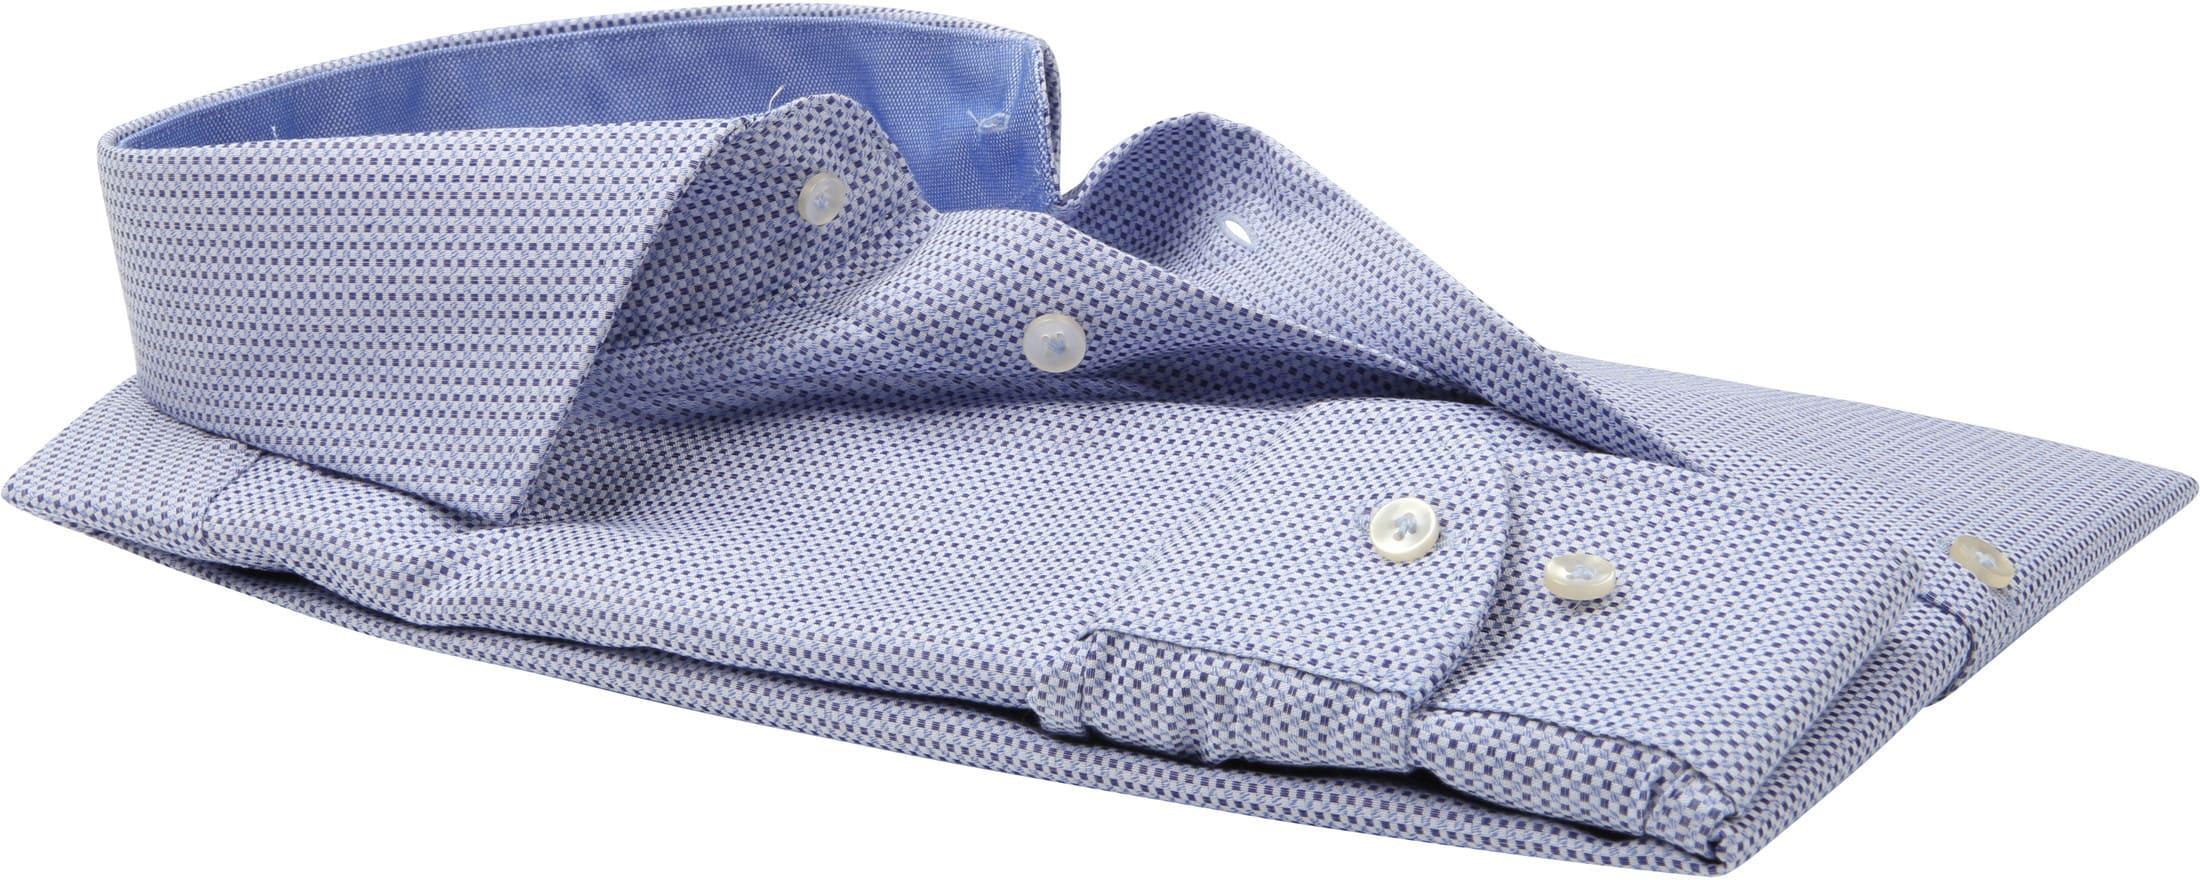 Profuomo Overhemd Slim-Fit Oxfort Blauw foto 3